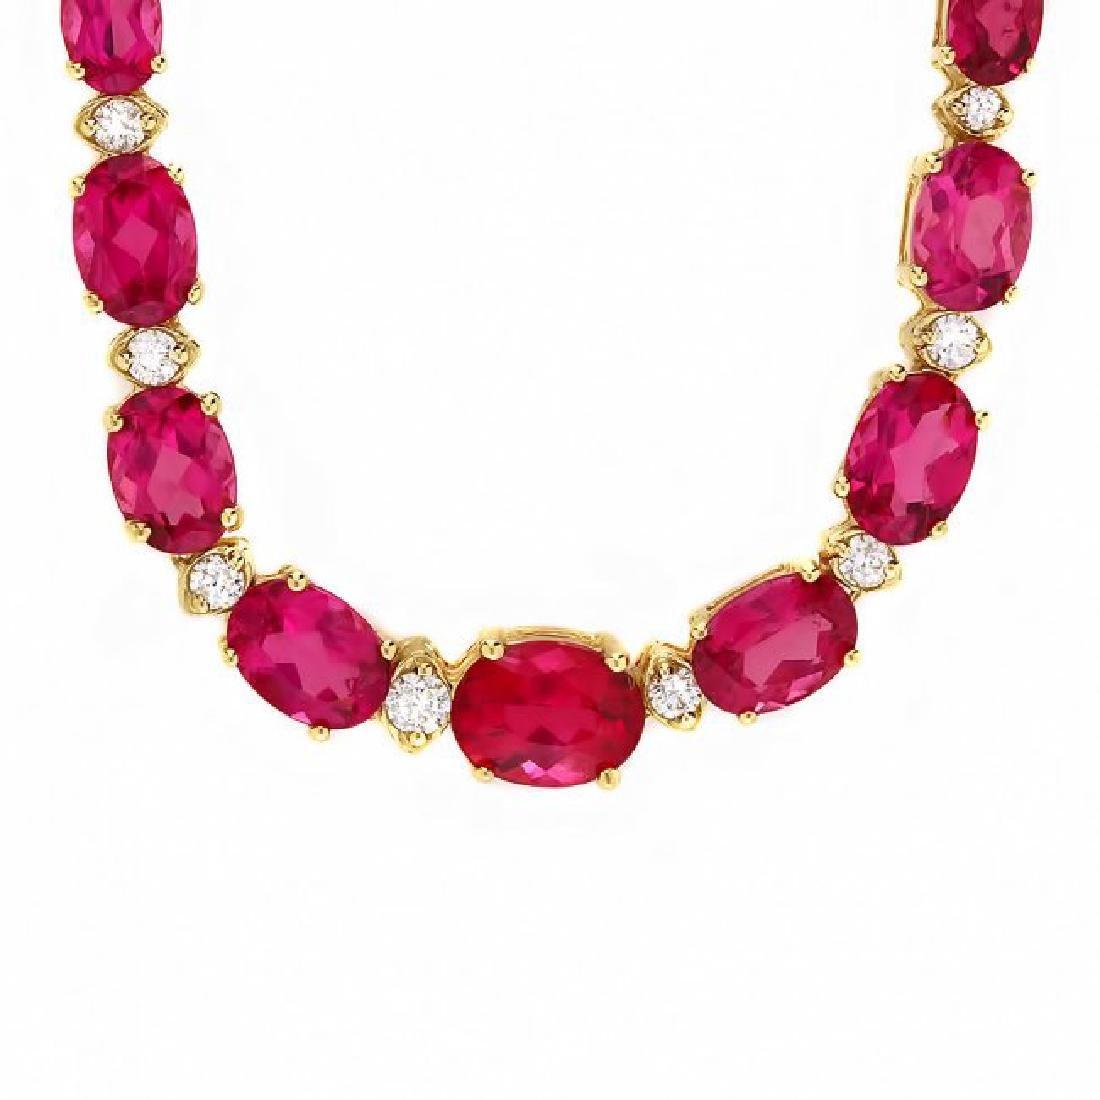 14k Gold 26ct Tourmaline 1.40ct Diamond Necklace - 2